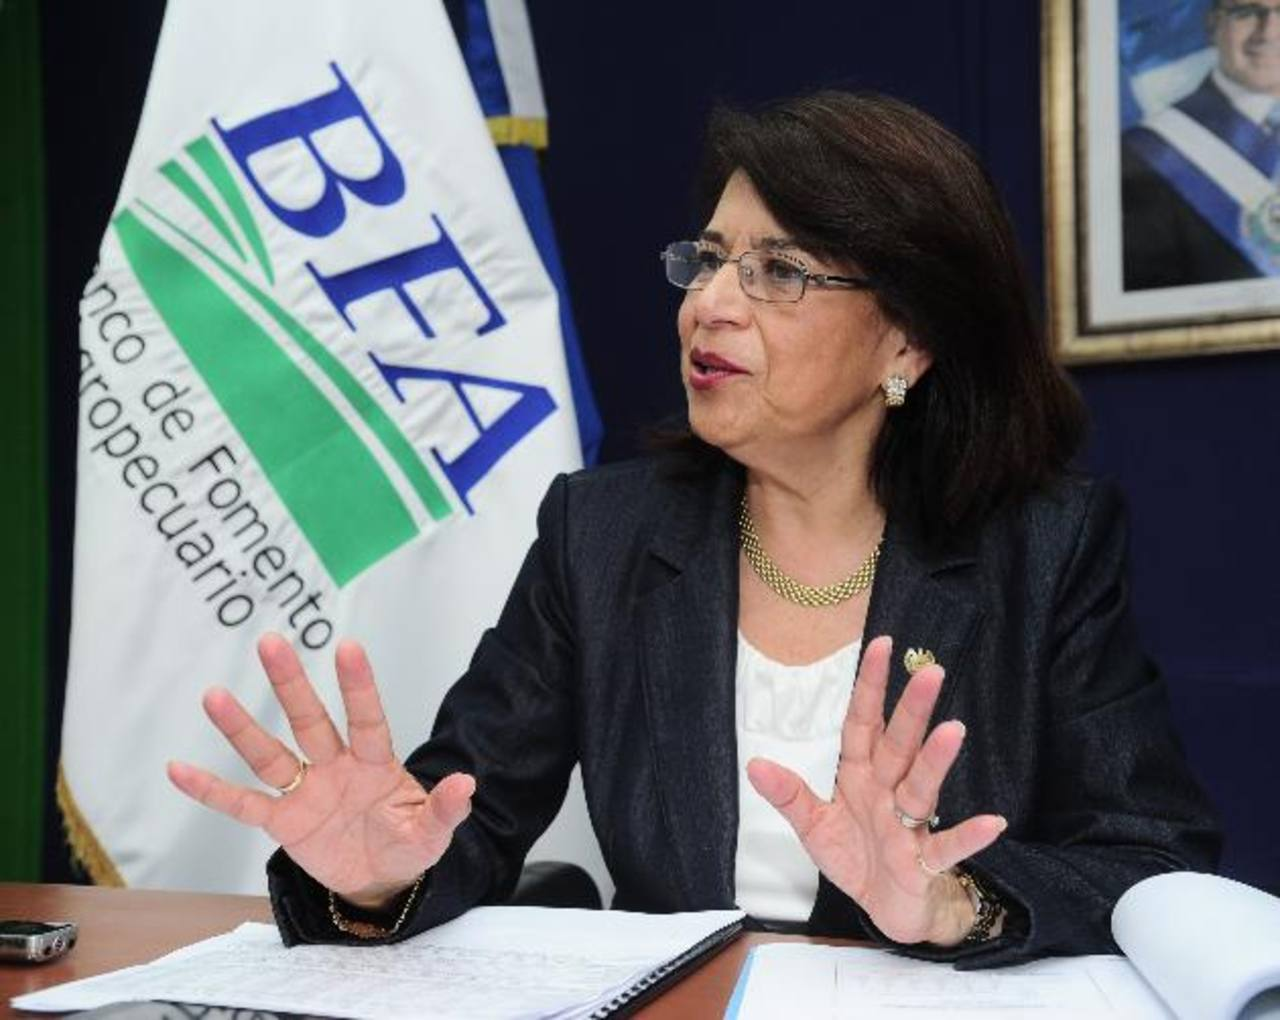 La presidenta del BFA, Mercedes de López, destacó el impulso que se da al sector productivo. FOTO EDH / R. QUINTANILLA